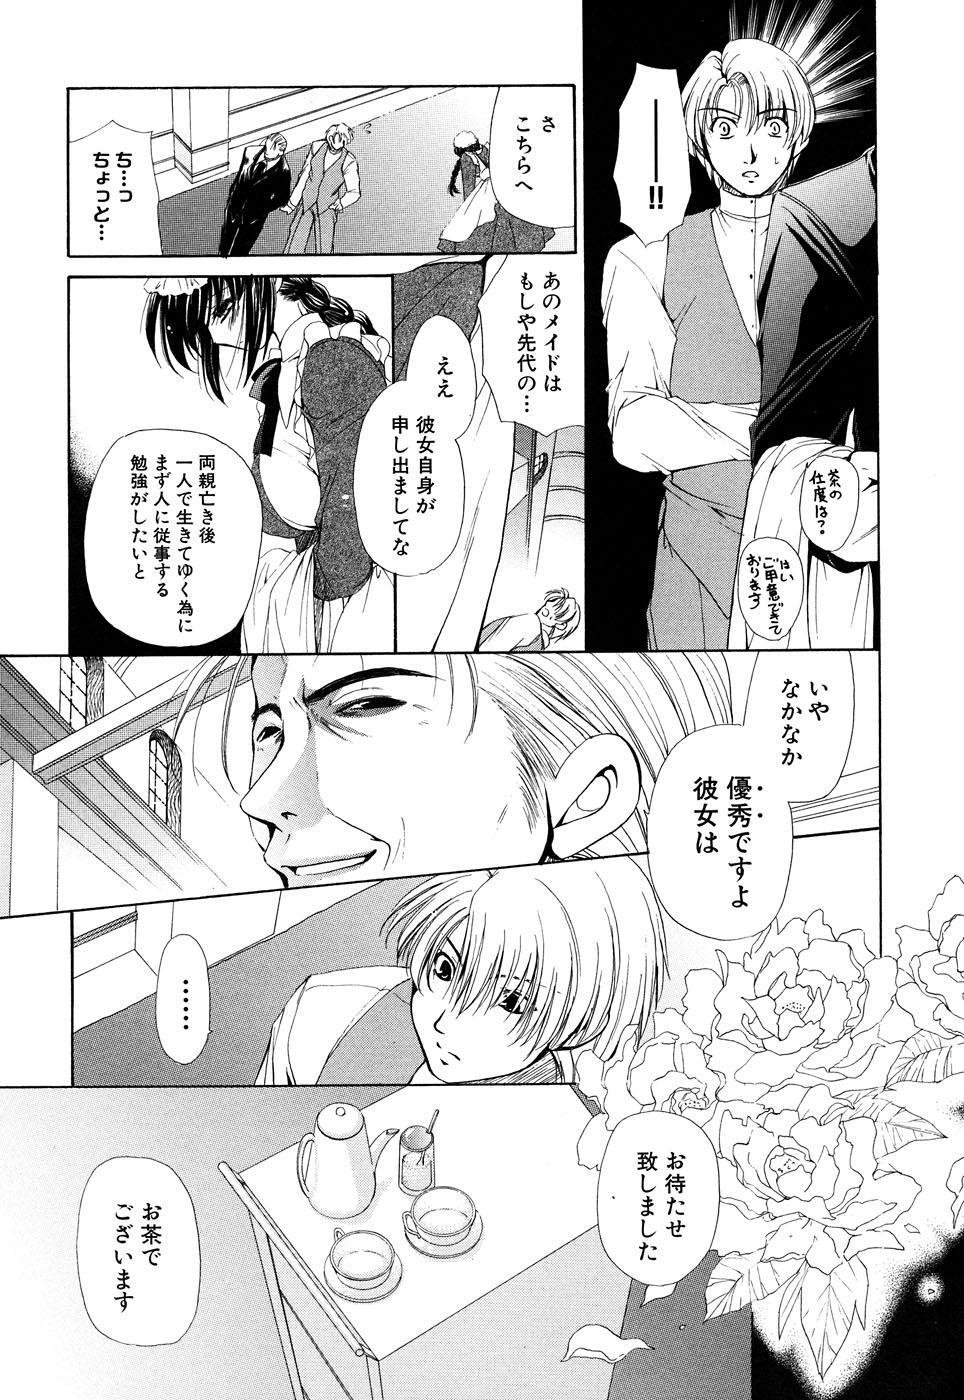 Fechikko VS Series ROUND.2 Miko San VS Maid San 113